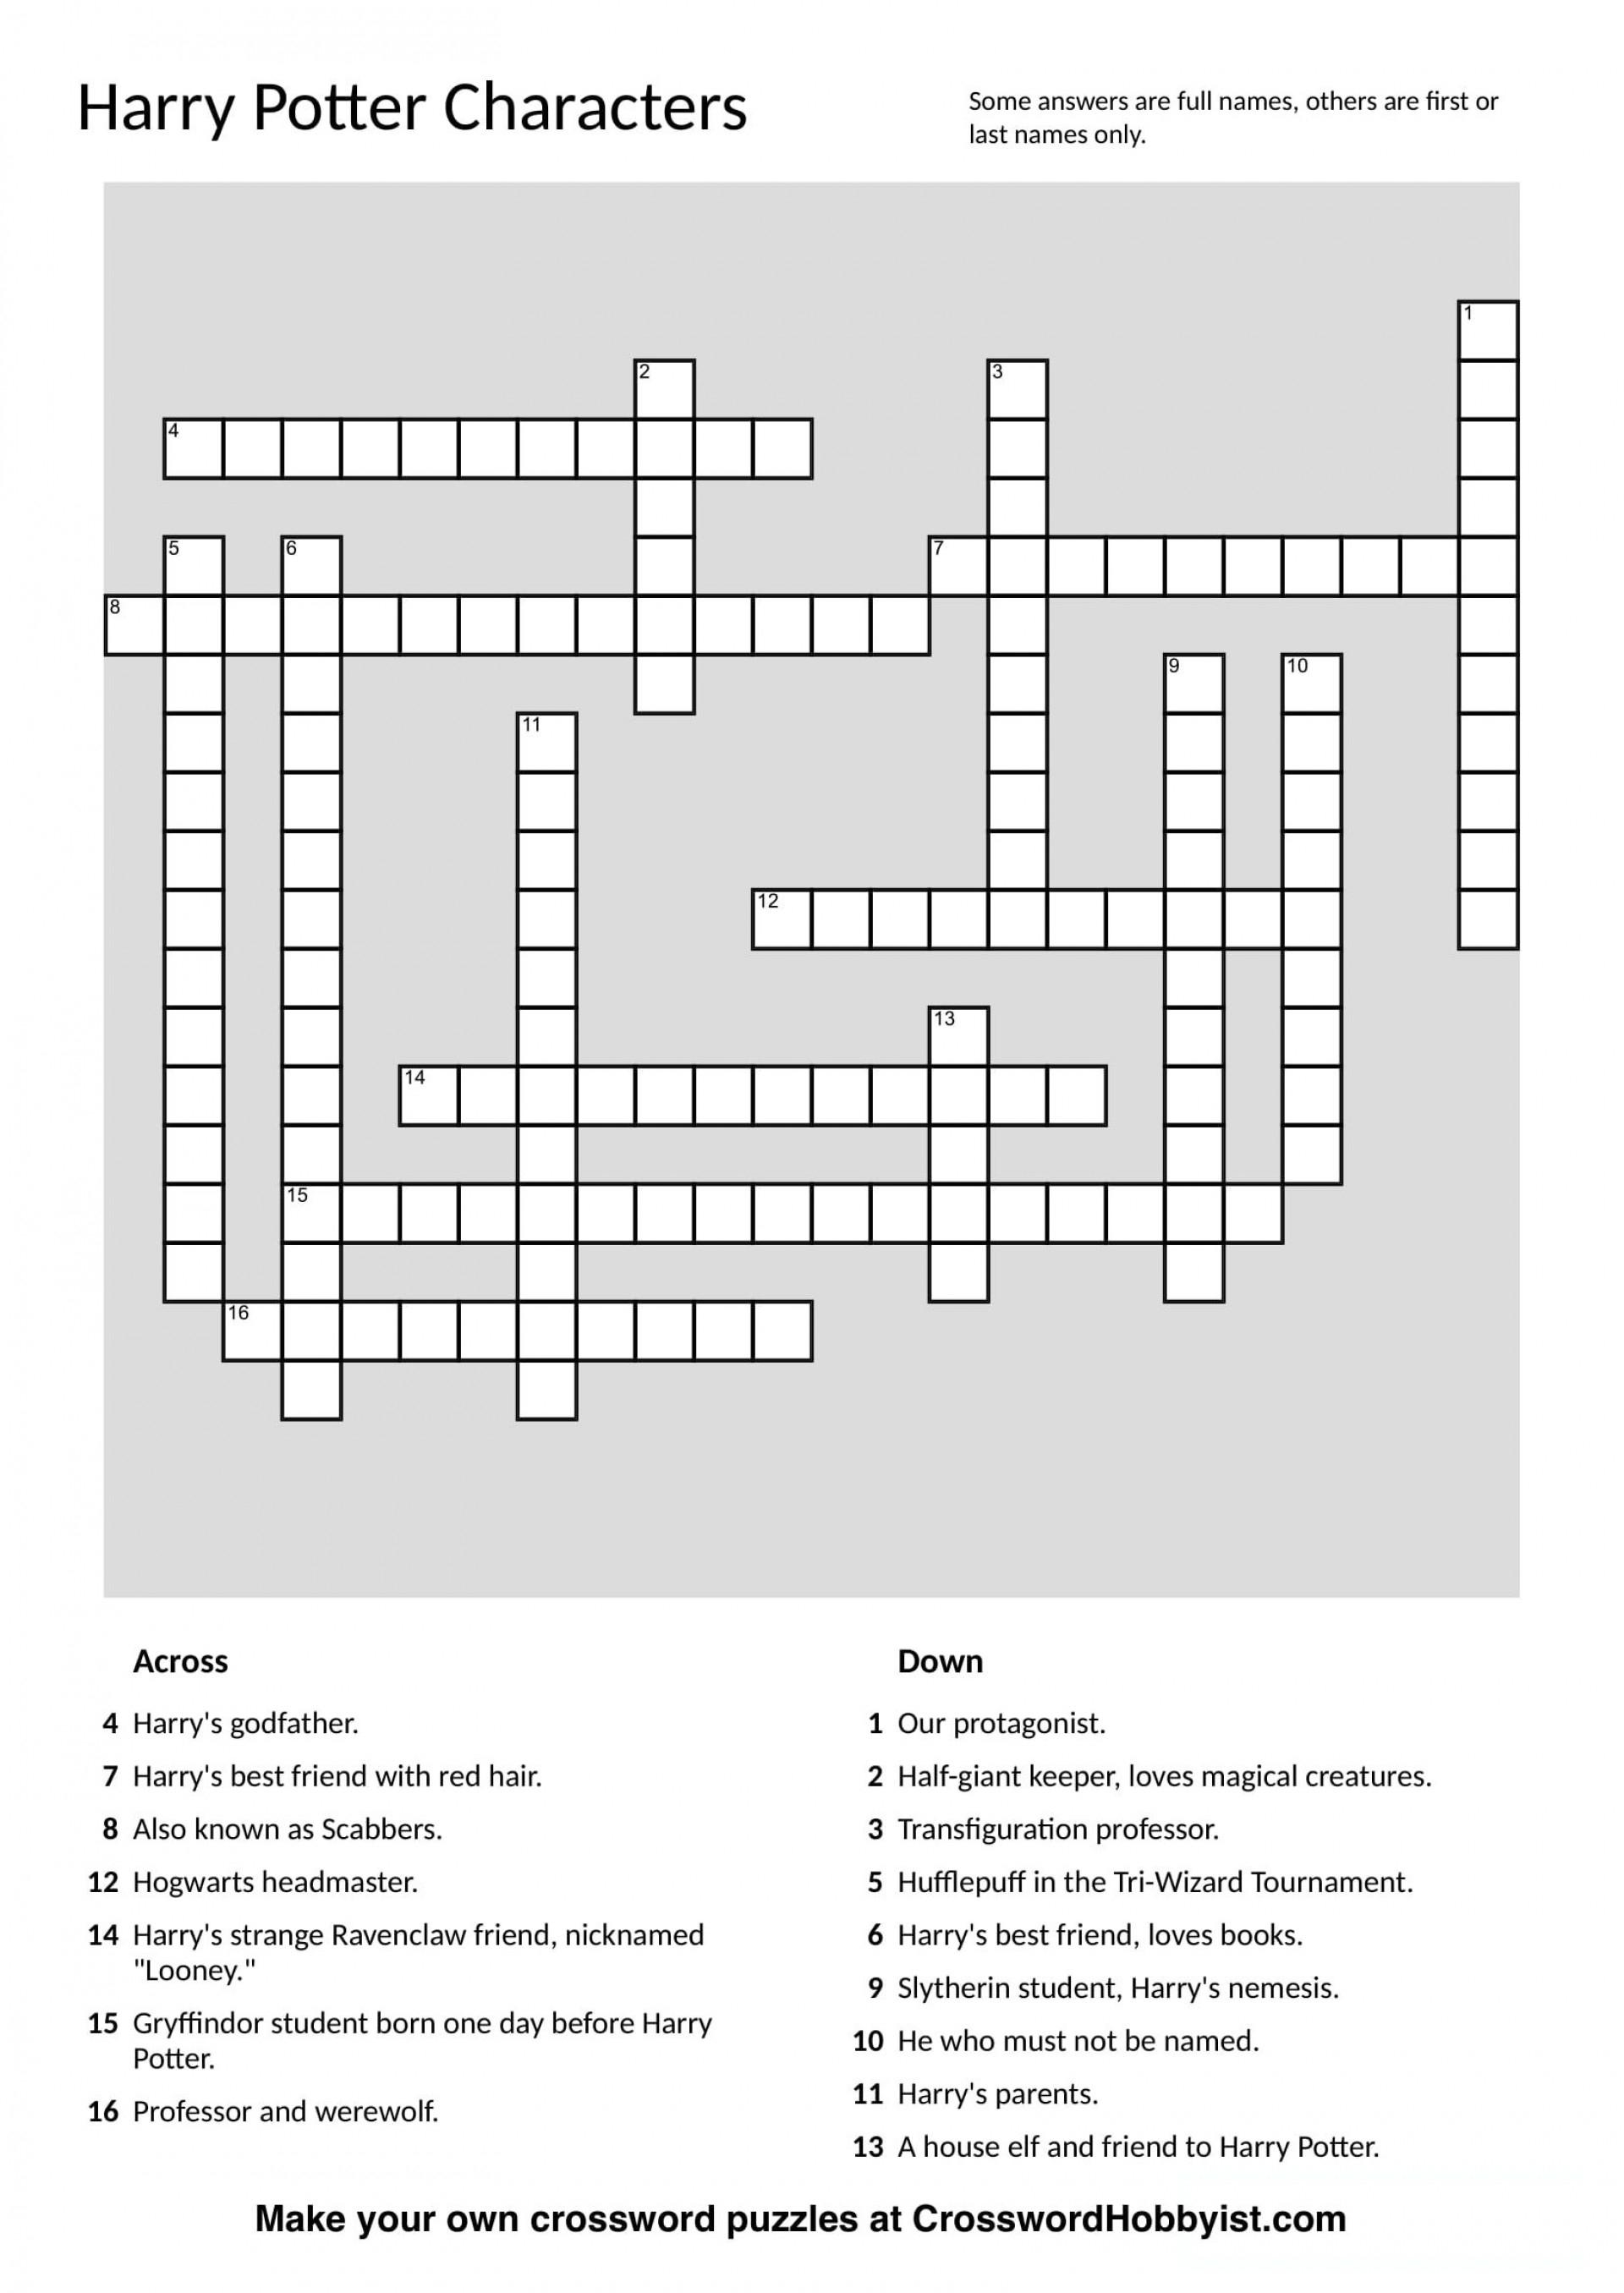 Crosswords Crossword Puzzle Make Your Own ~ Themarketonholly - Make Your Own Crossword Puzzle Free Printable